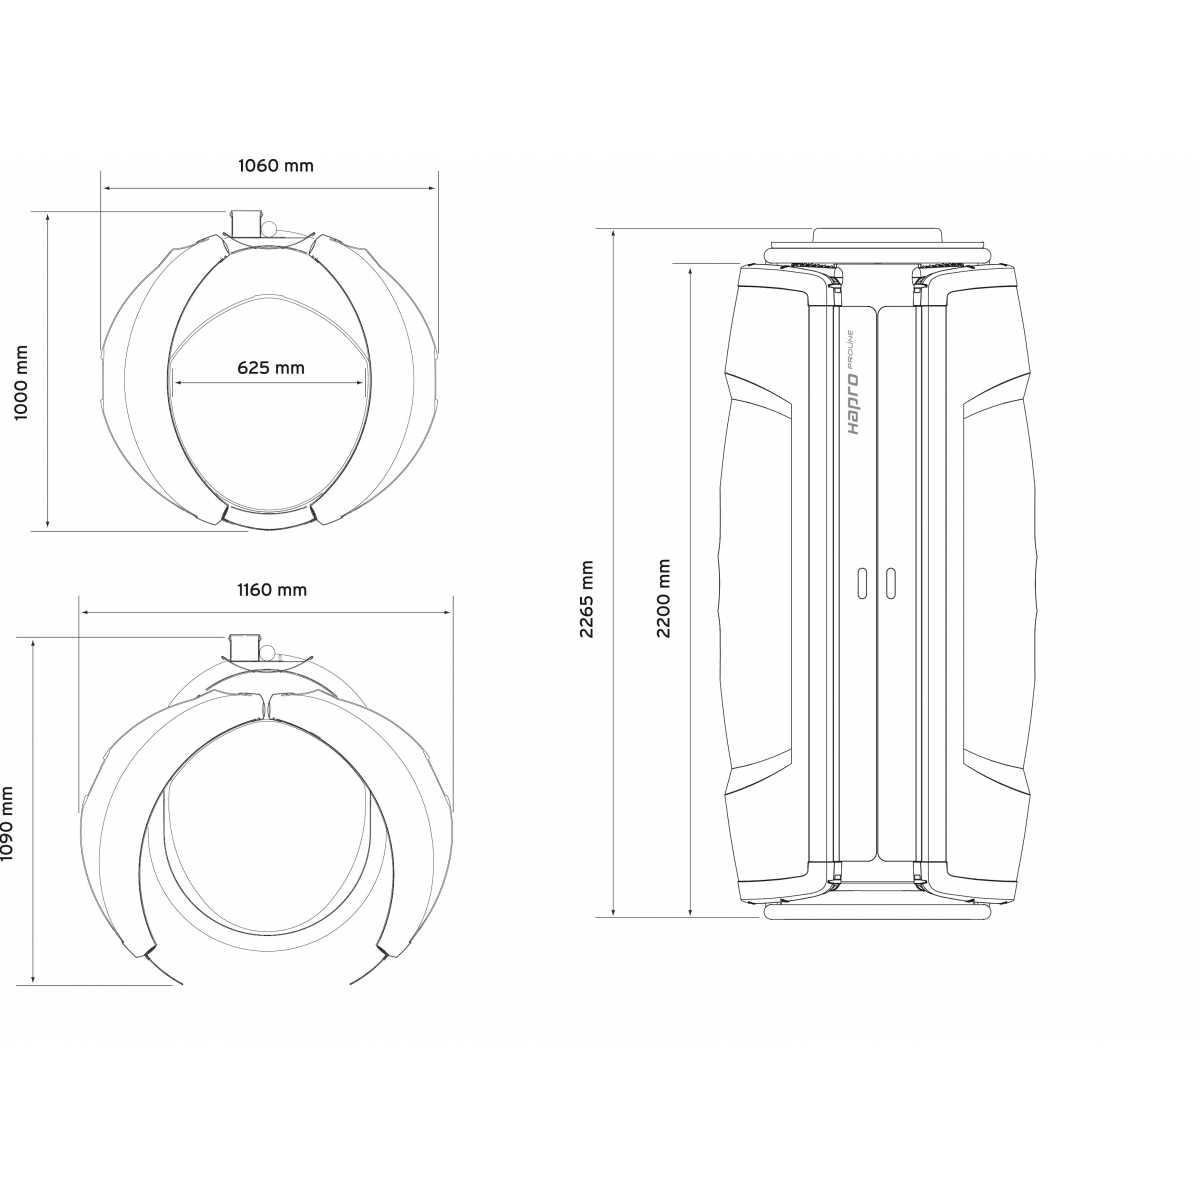 Hapro Proline 28 V Intensive White Special - Solarium vertical - Home Tanning - Hapro